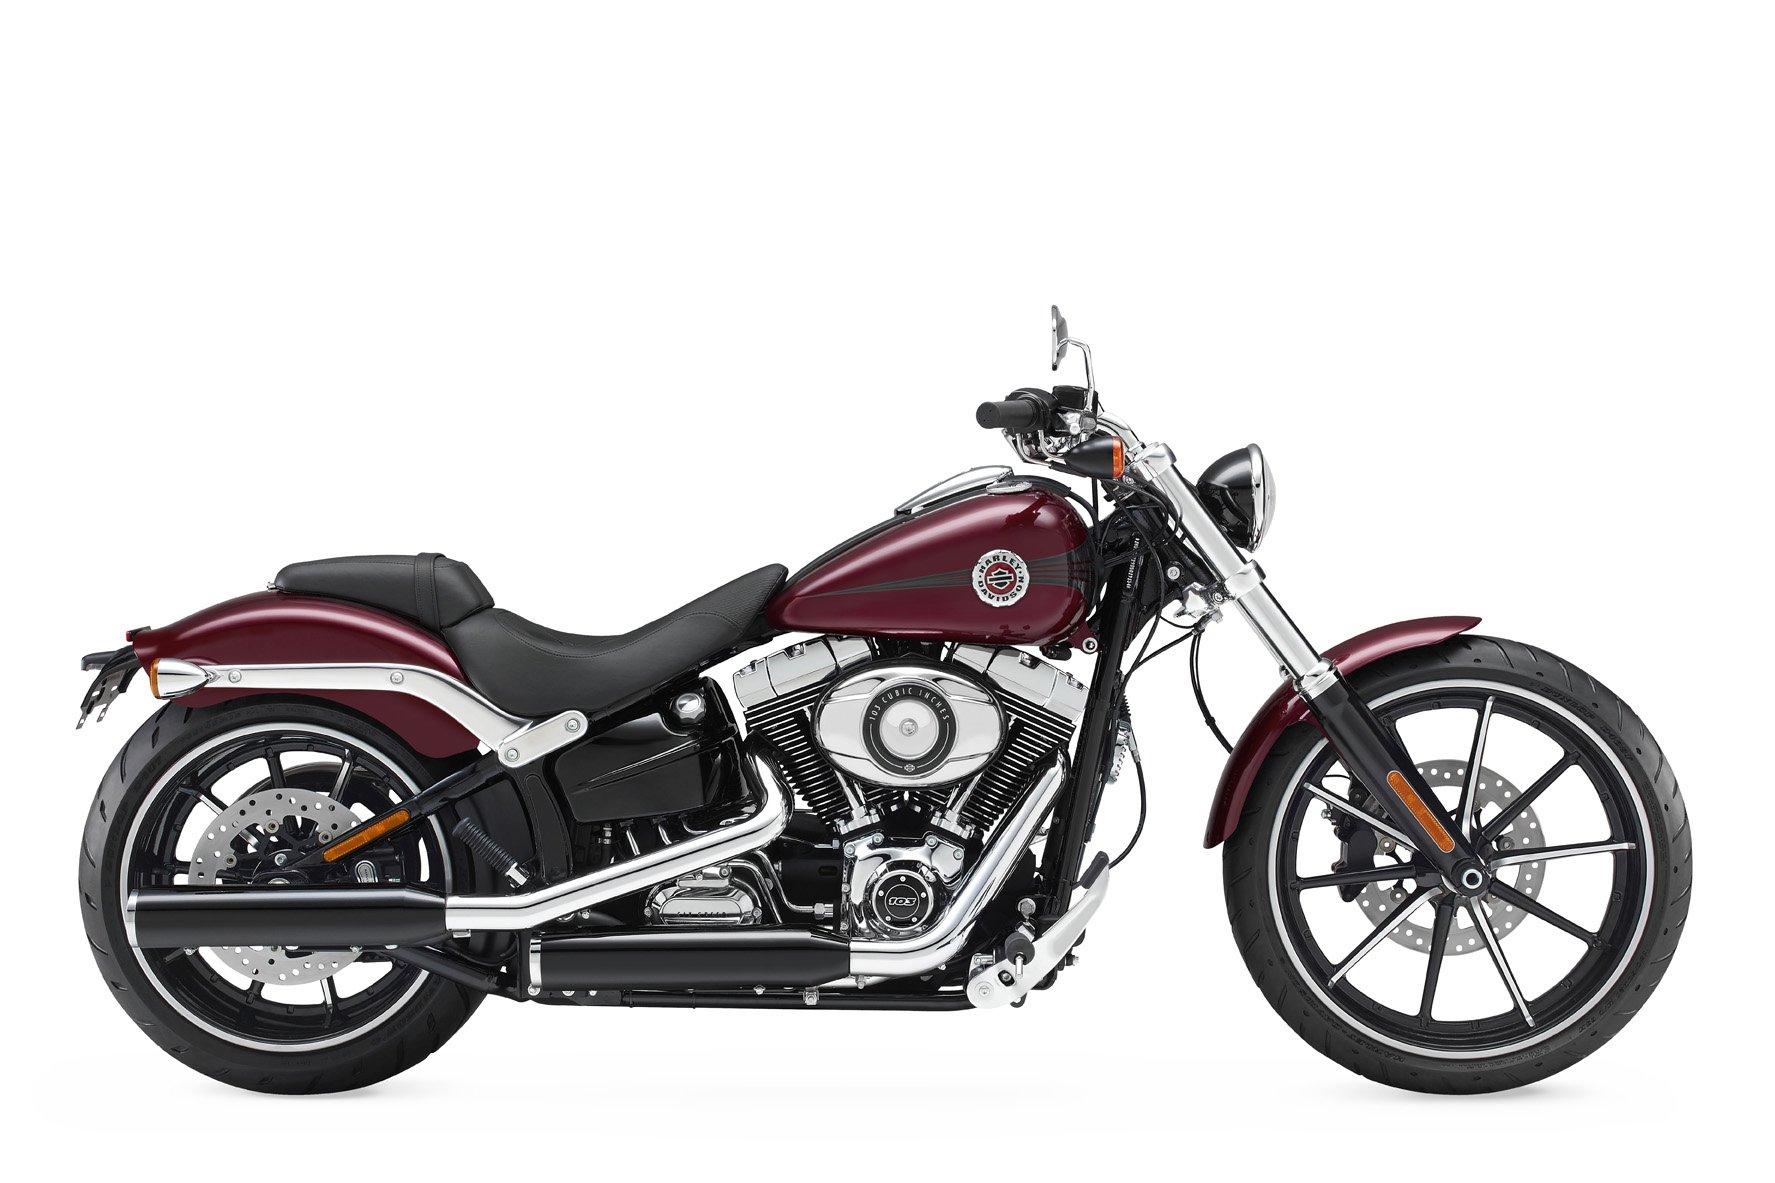 Harley davidson softail breakout fxsb 2015 chopper cruiser